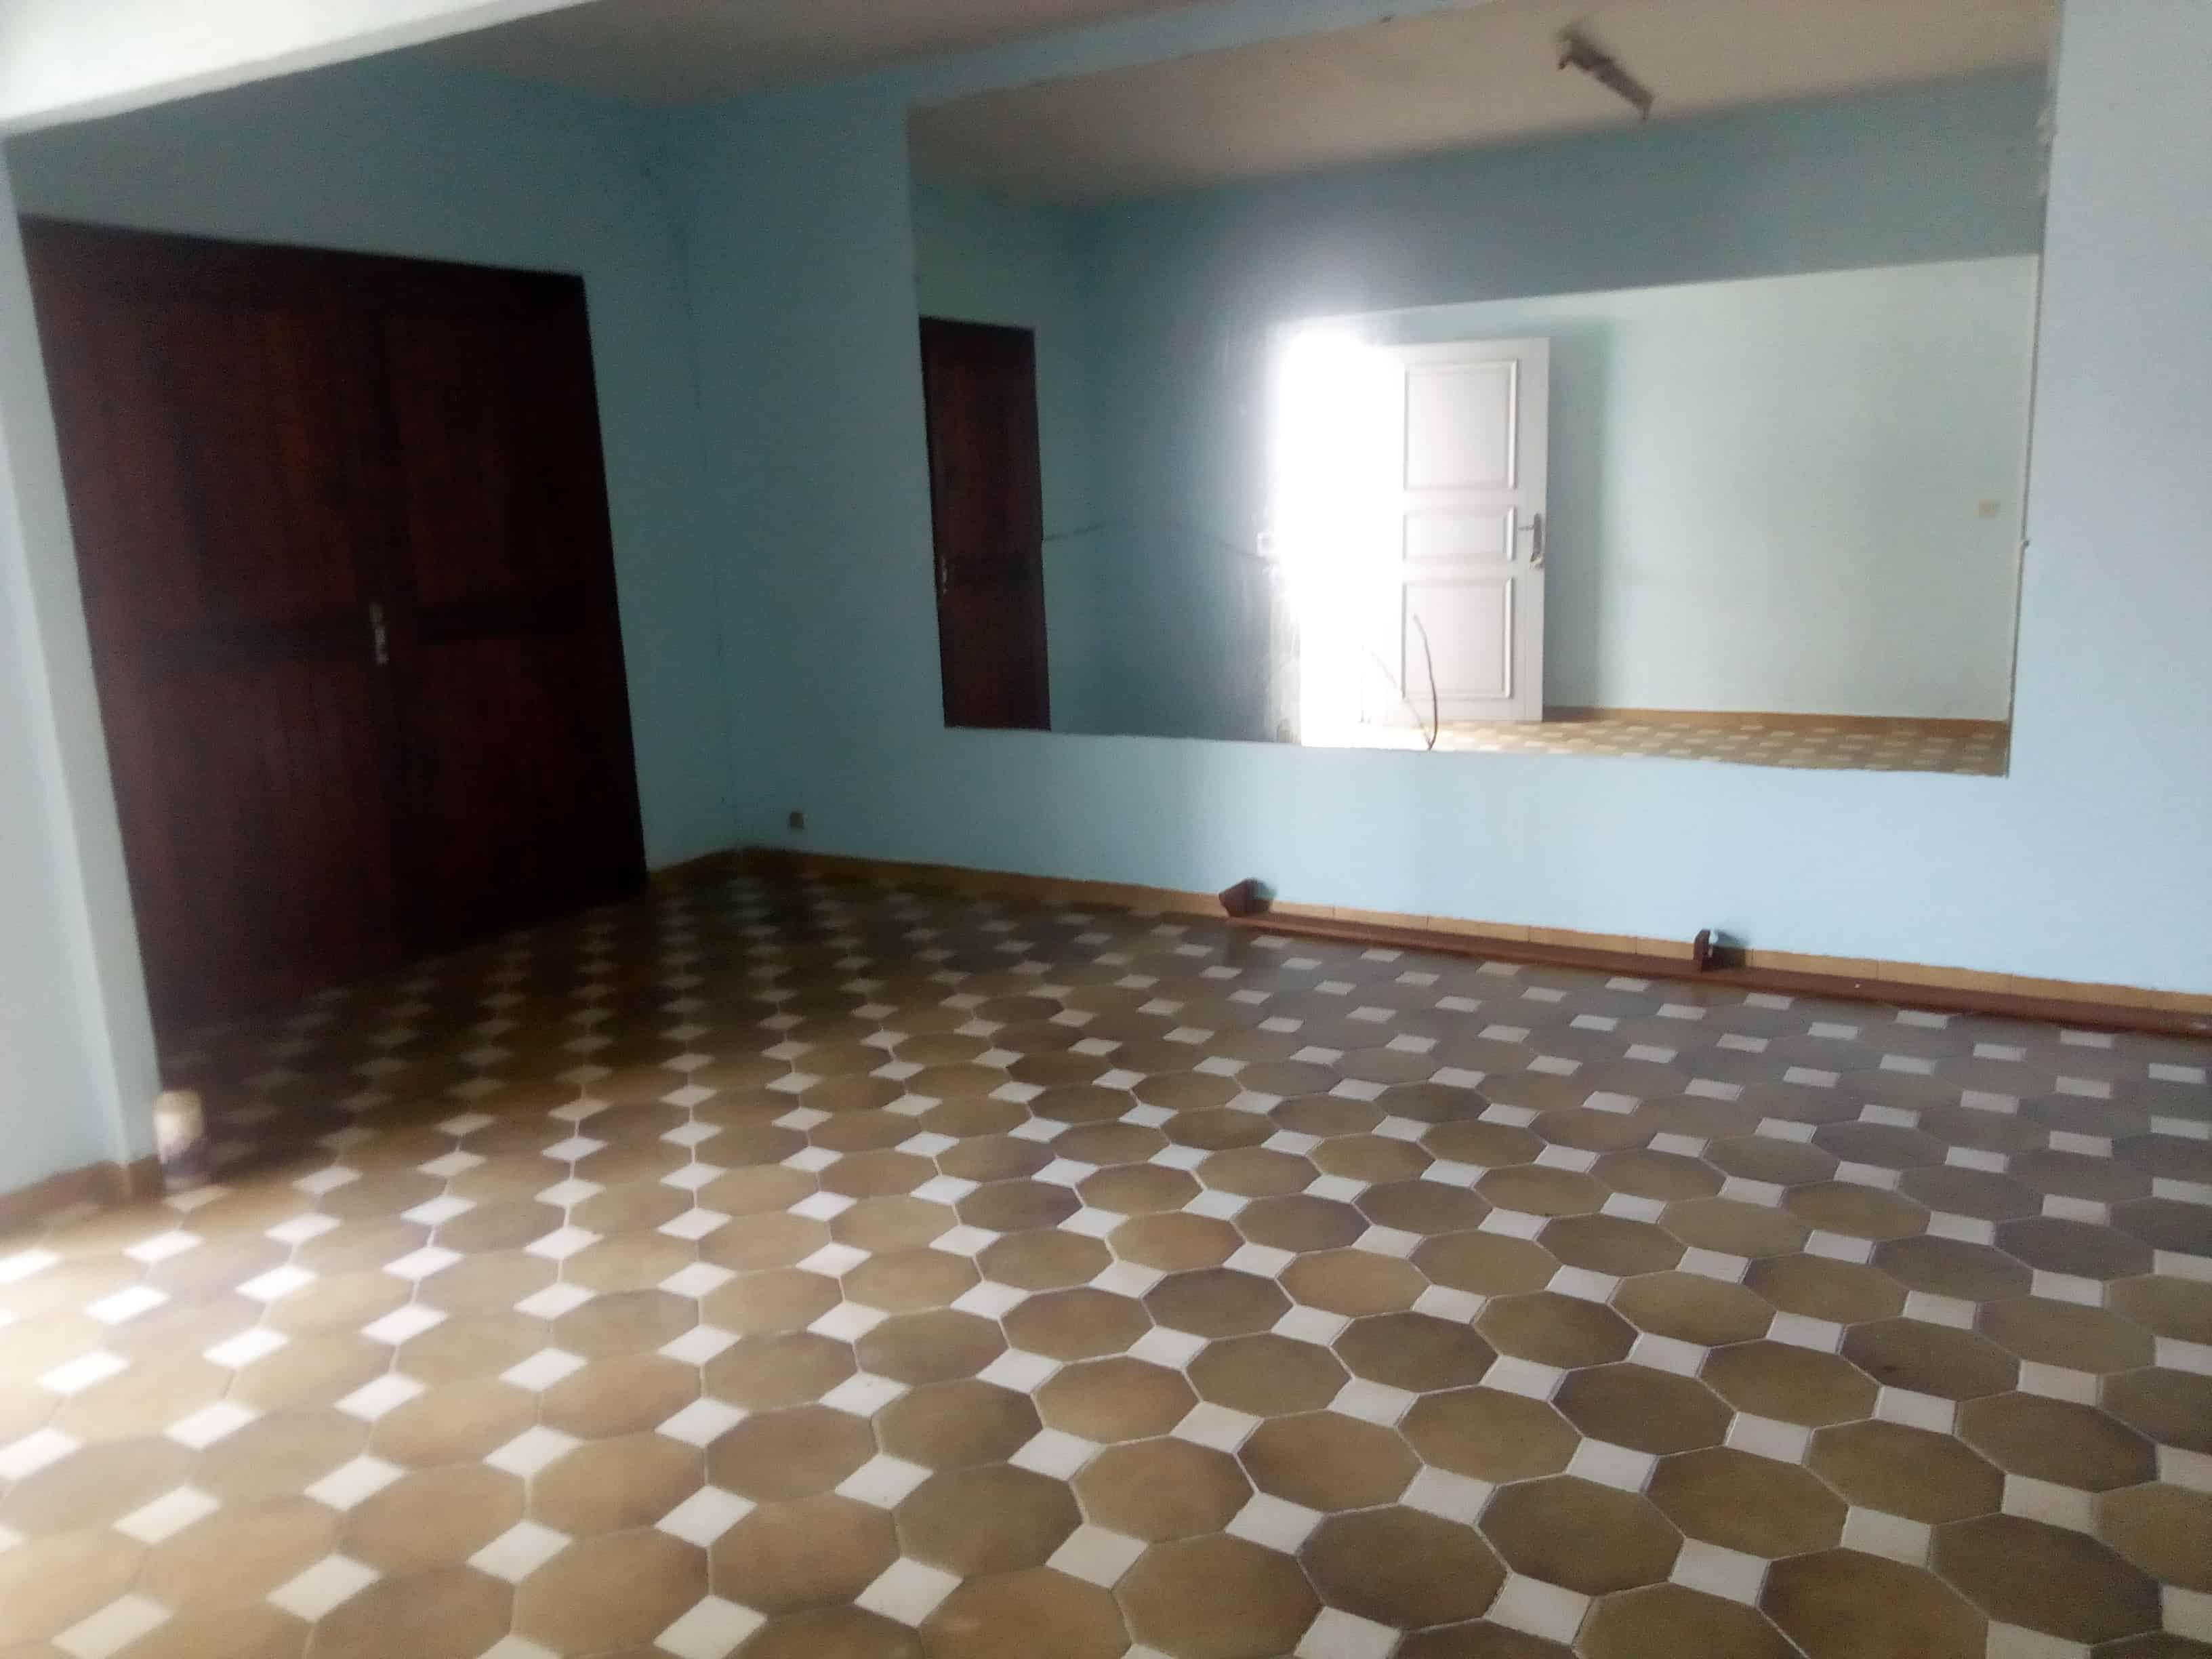 House (Villa) to rent - Douala, Bonamoussadi, Prêt à habiter - 1 living room(s), 4 bedroom(s), 2 bathroom(s) - 180 000 FCFA / month